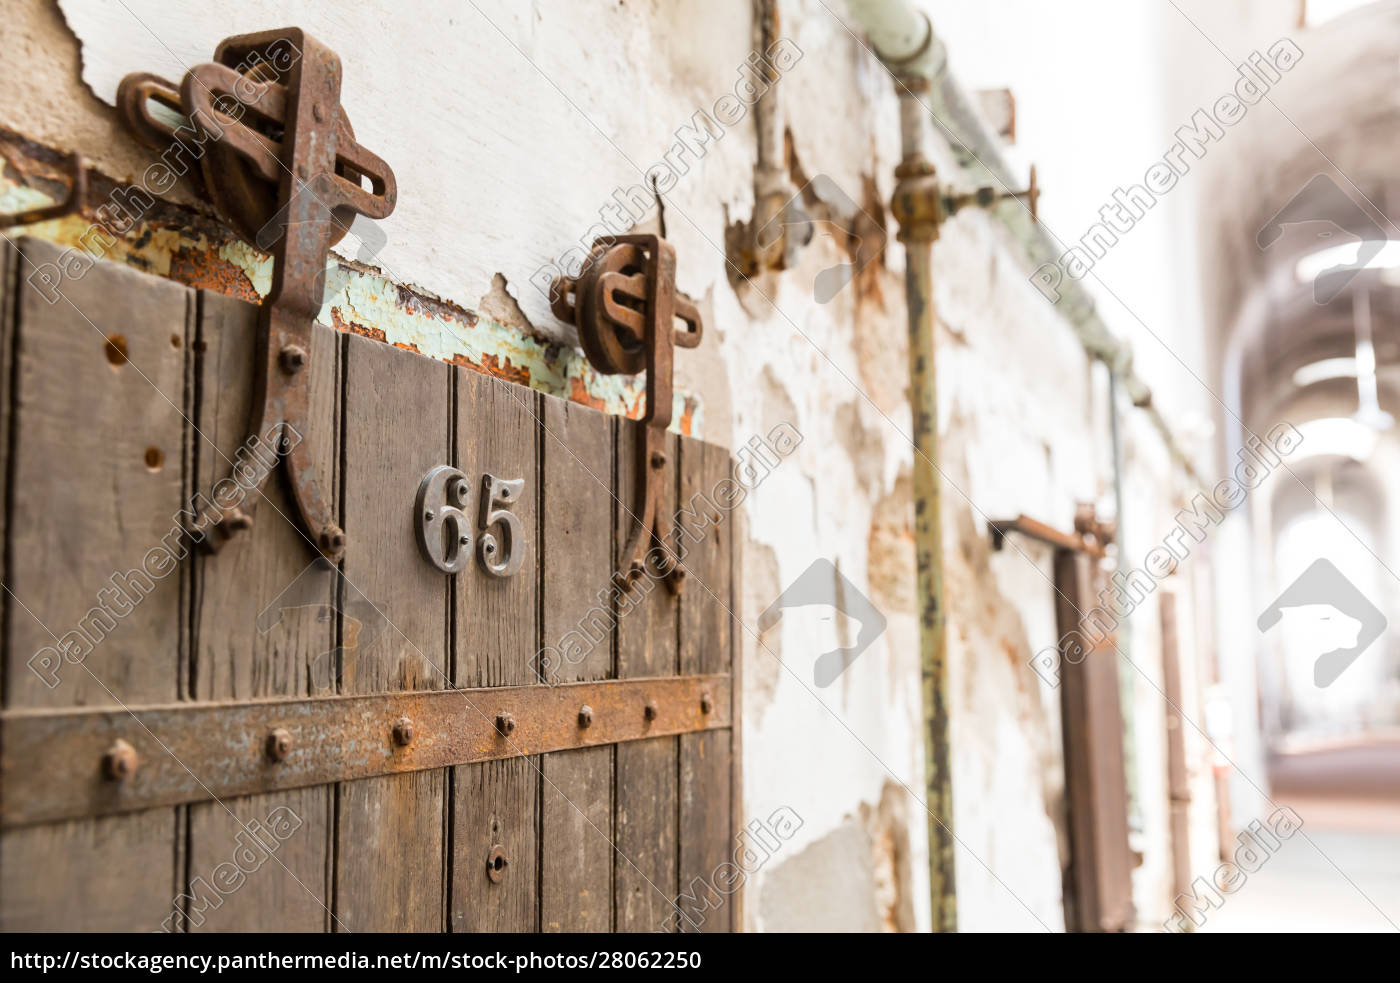 wooden, door, of, old, prison, cell - 28062250